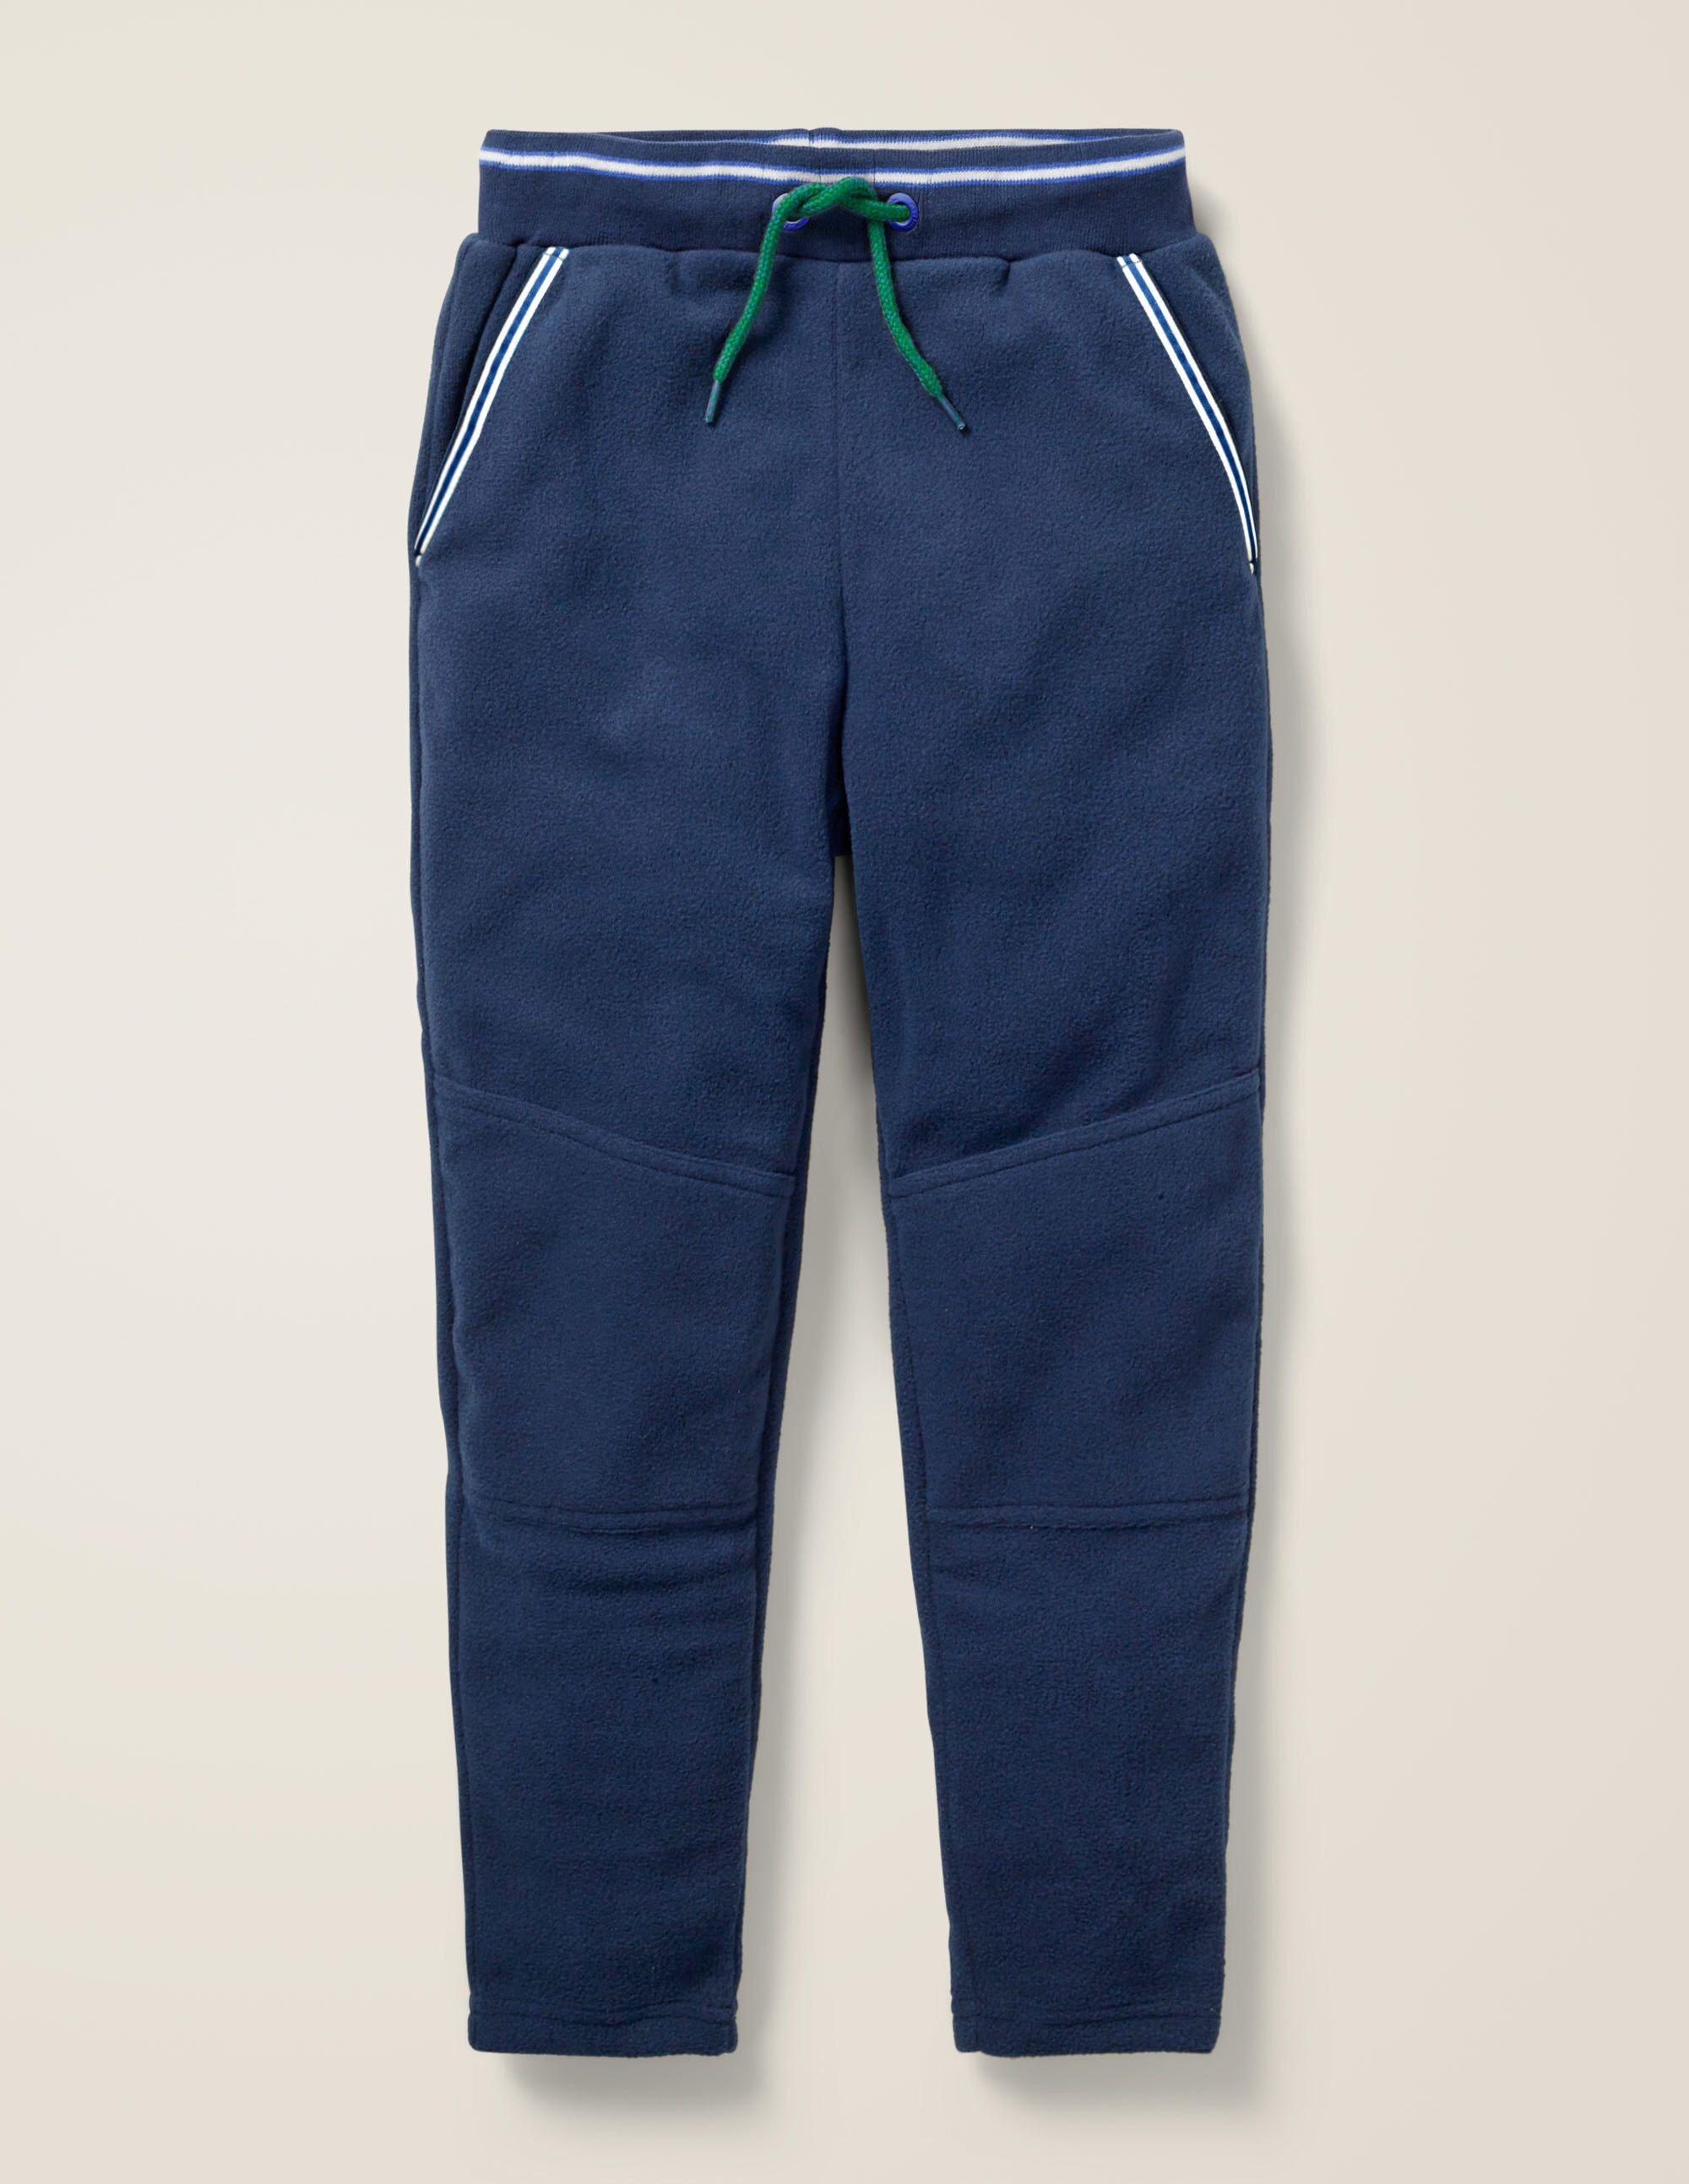 Mini Pantalon de survêtement en micro-polaire BLU Garçon Boden, Blue - 3a